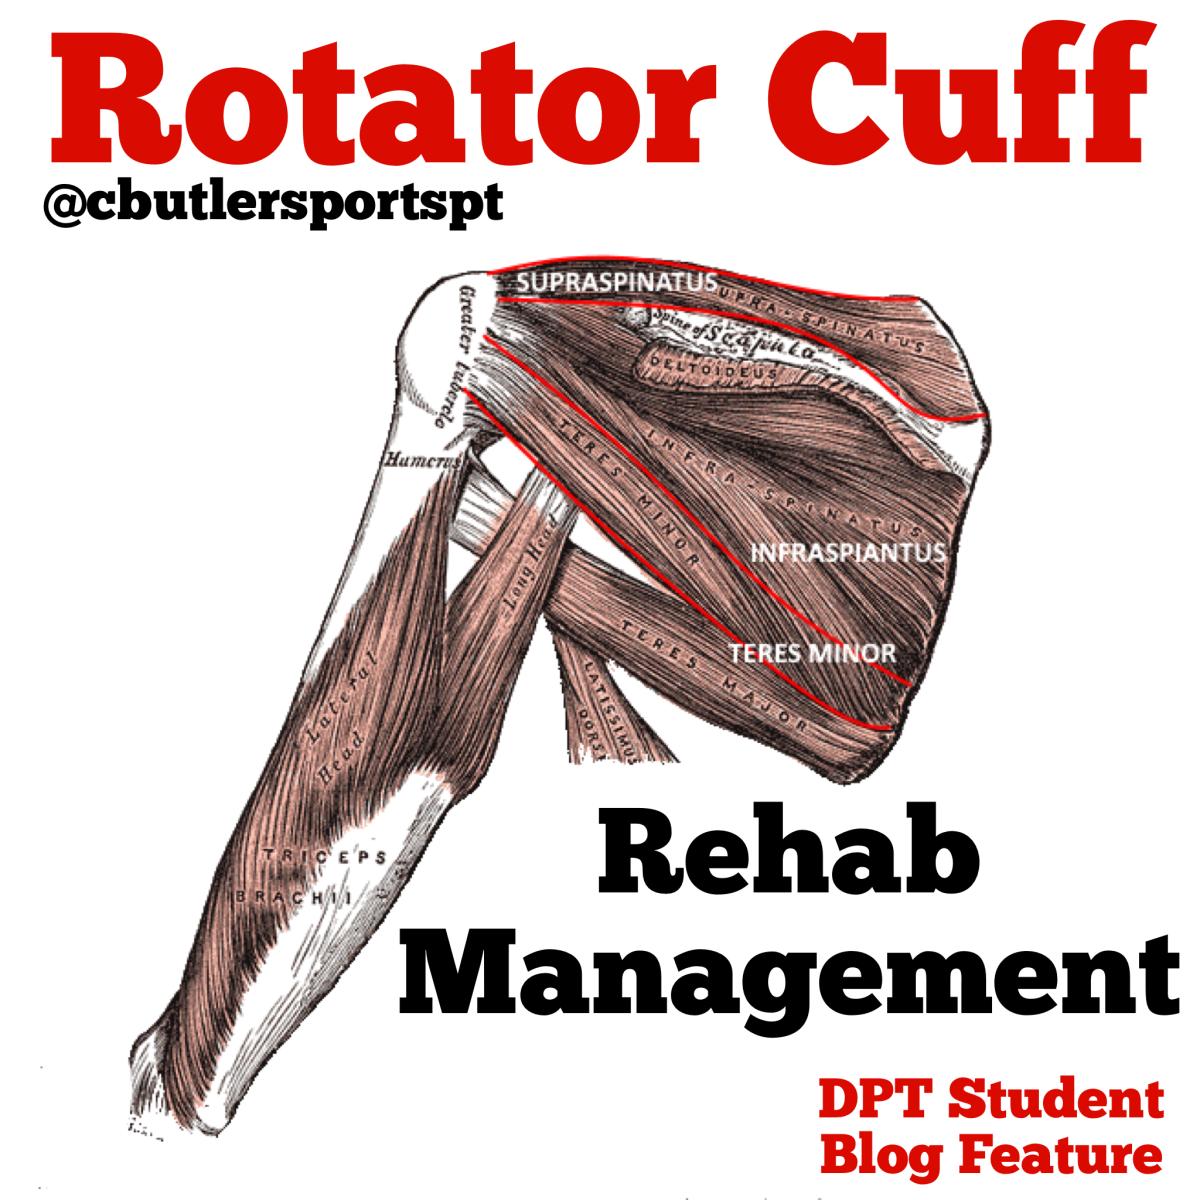 Rotator Cuff RehabManagement